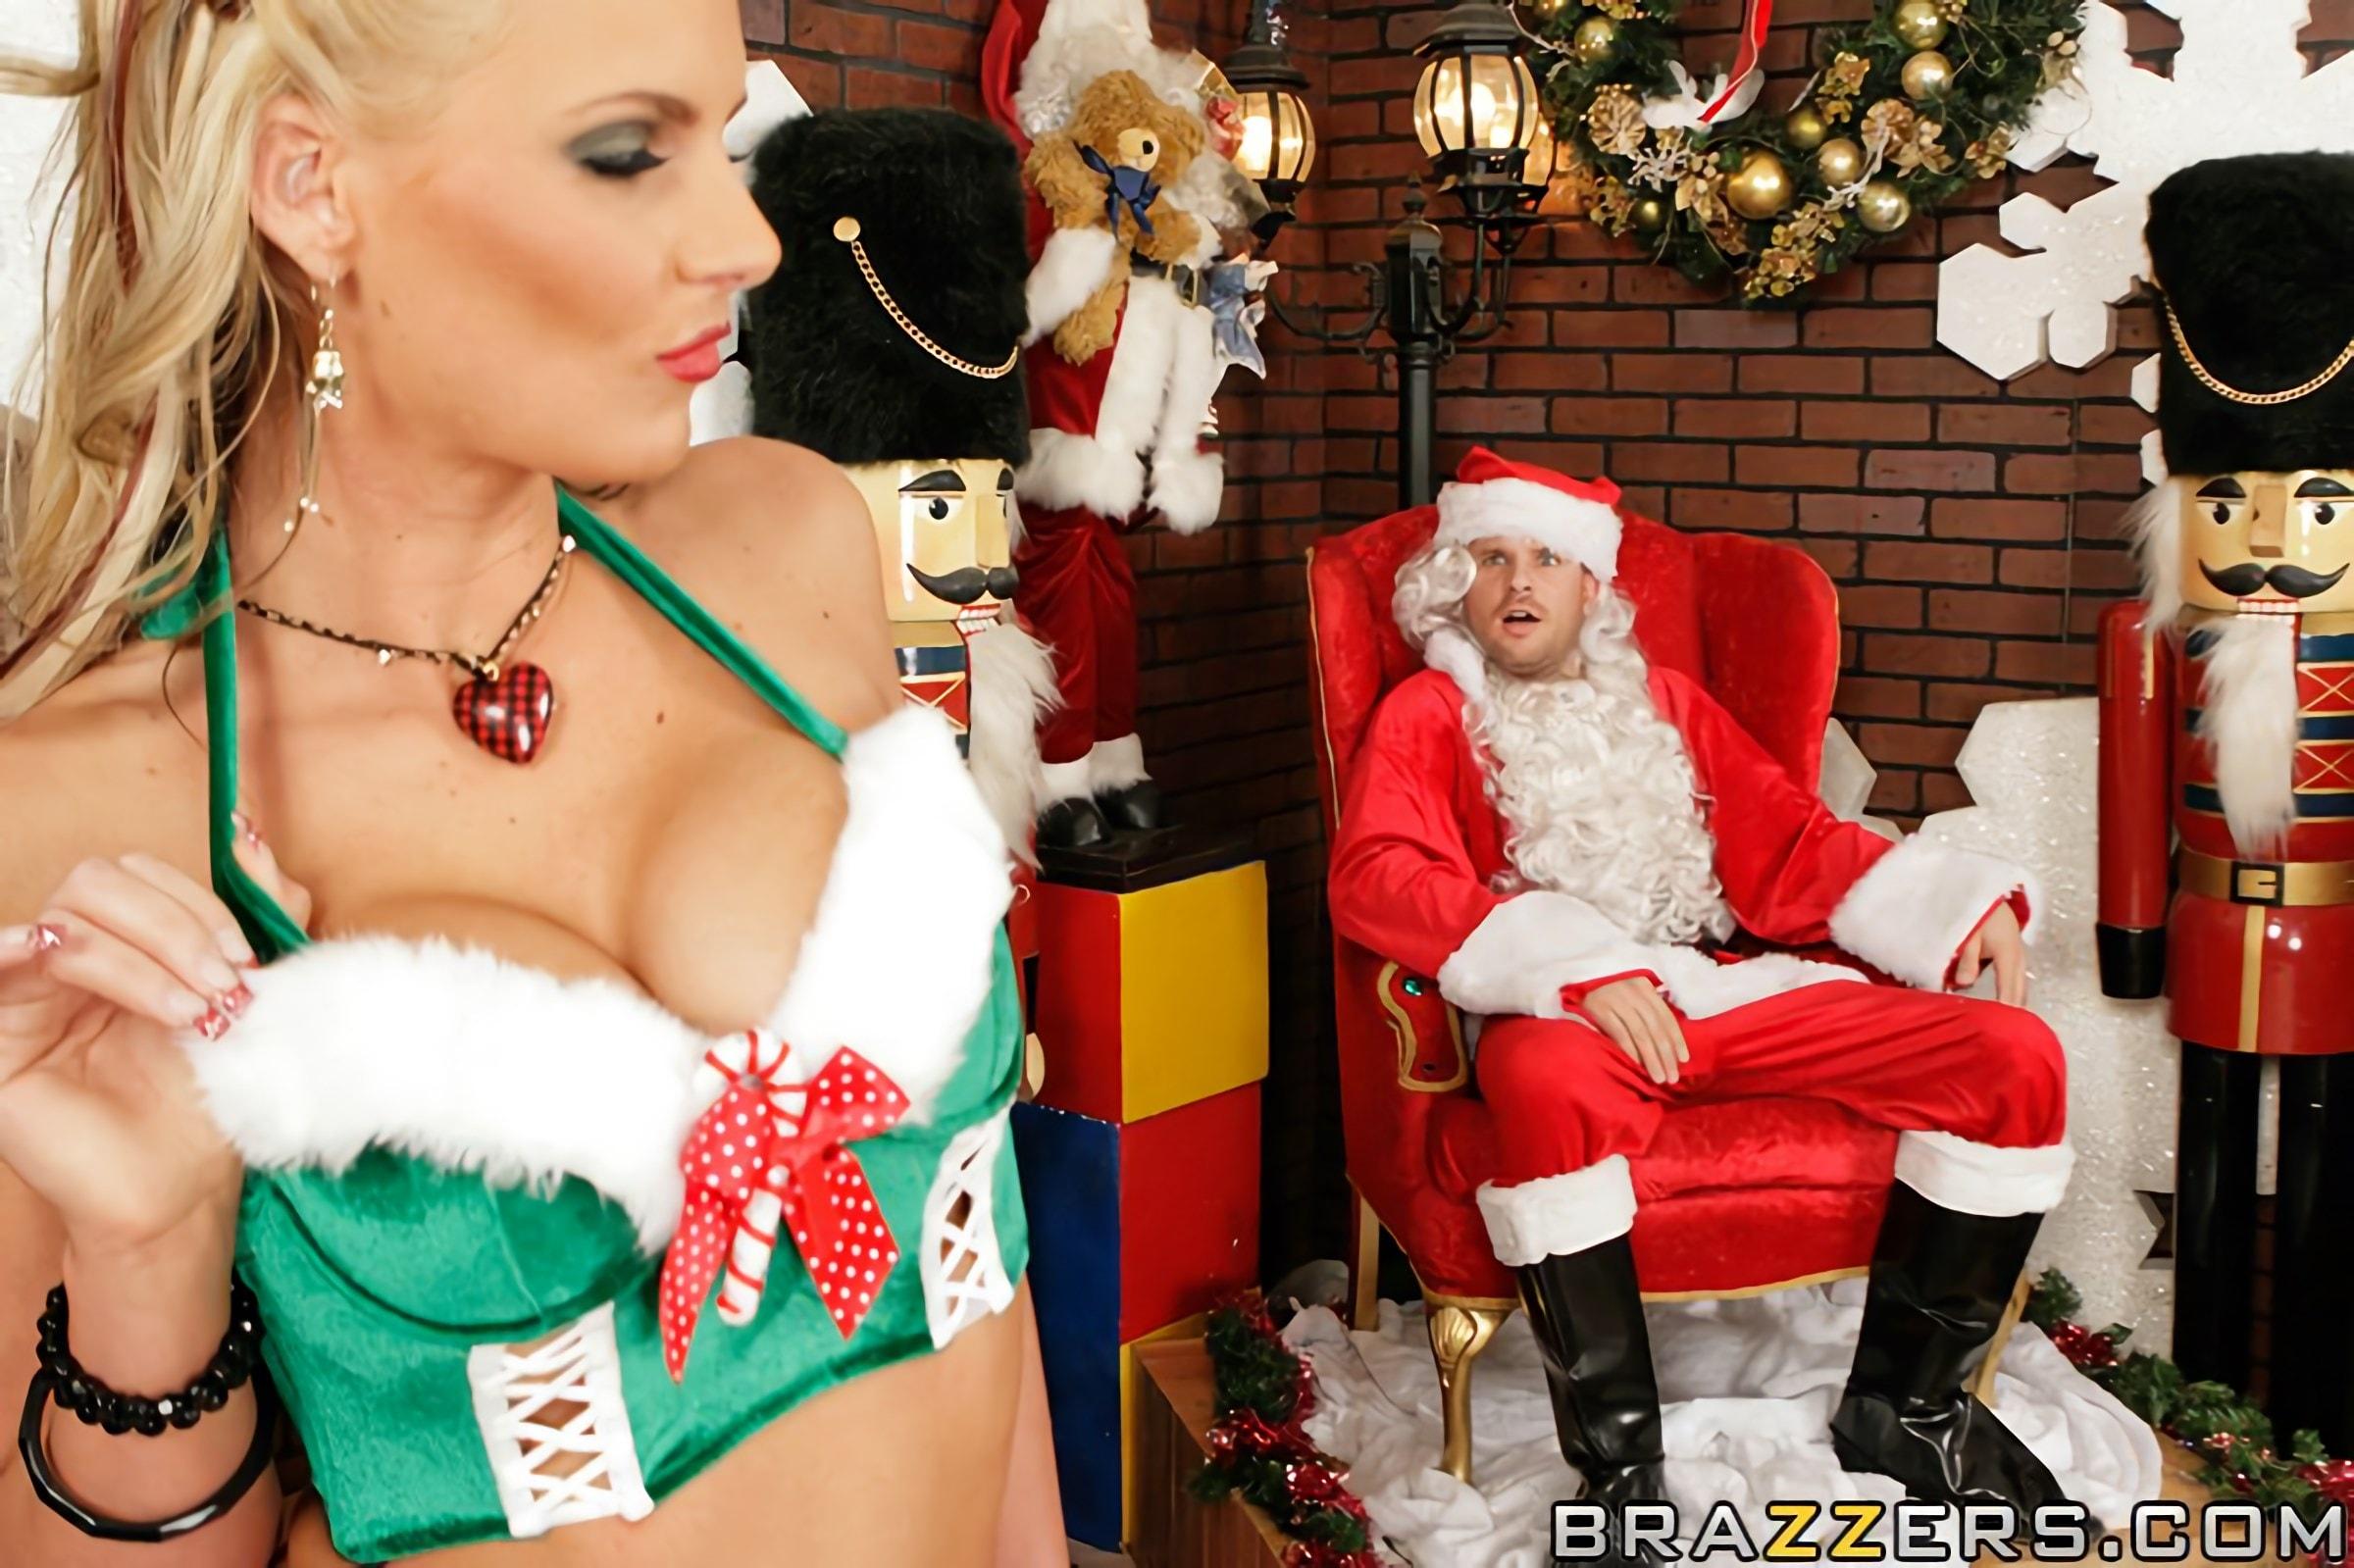 Brazzers 'Santas Busty Helper' starring Phoenix Marie (Photo 5)